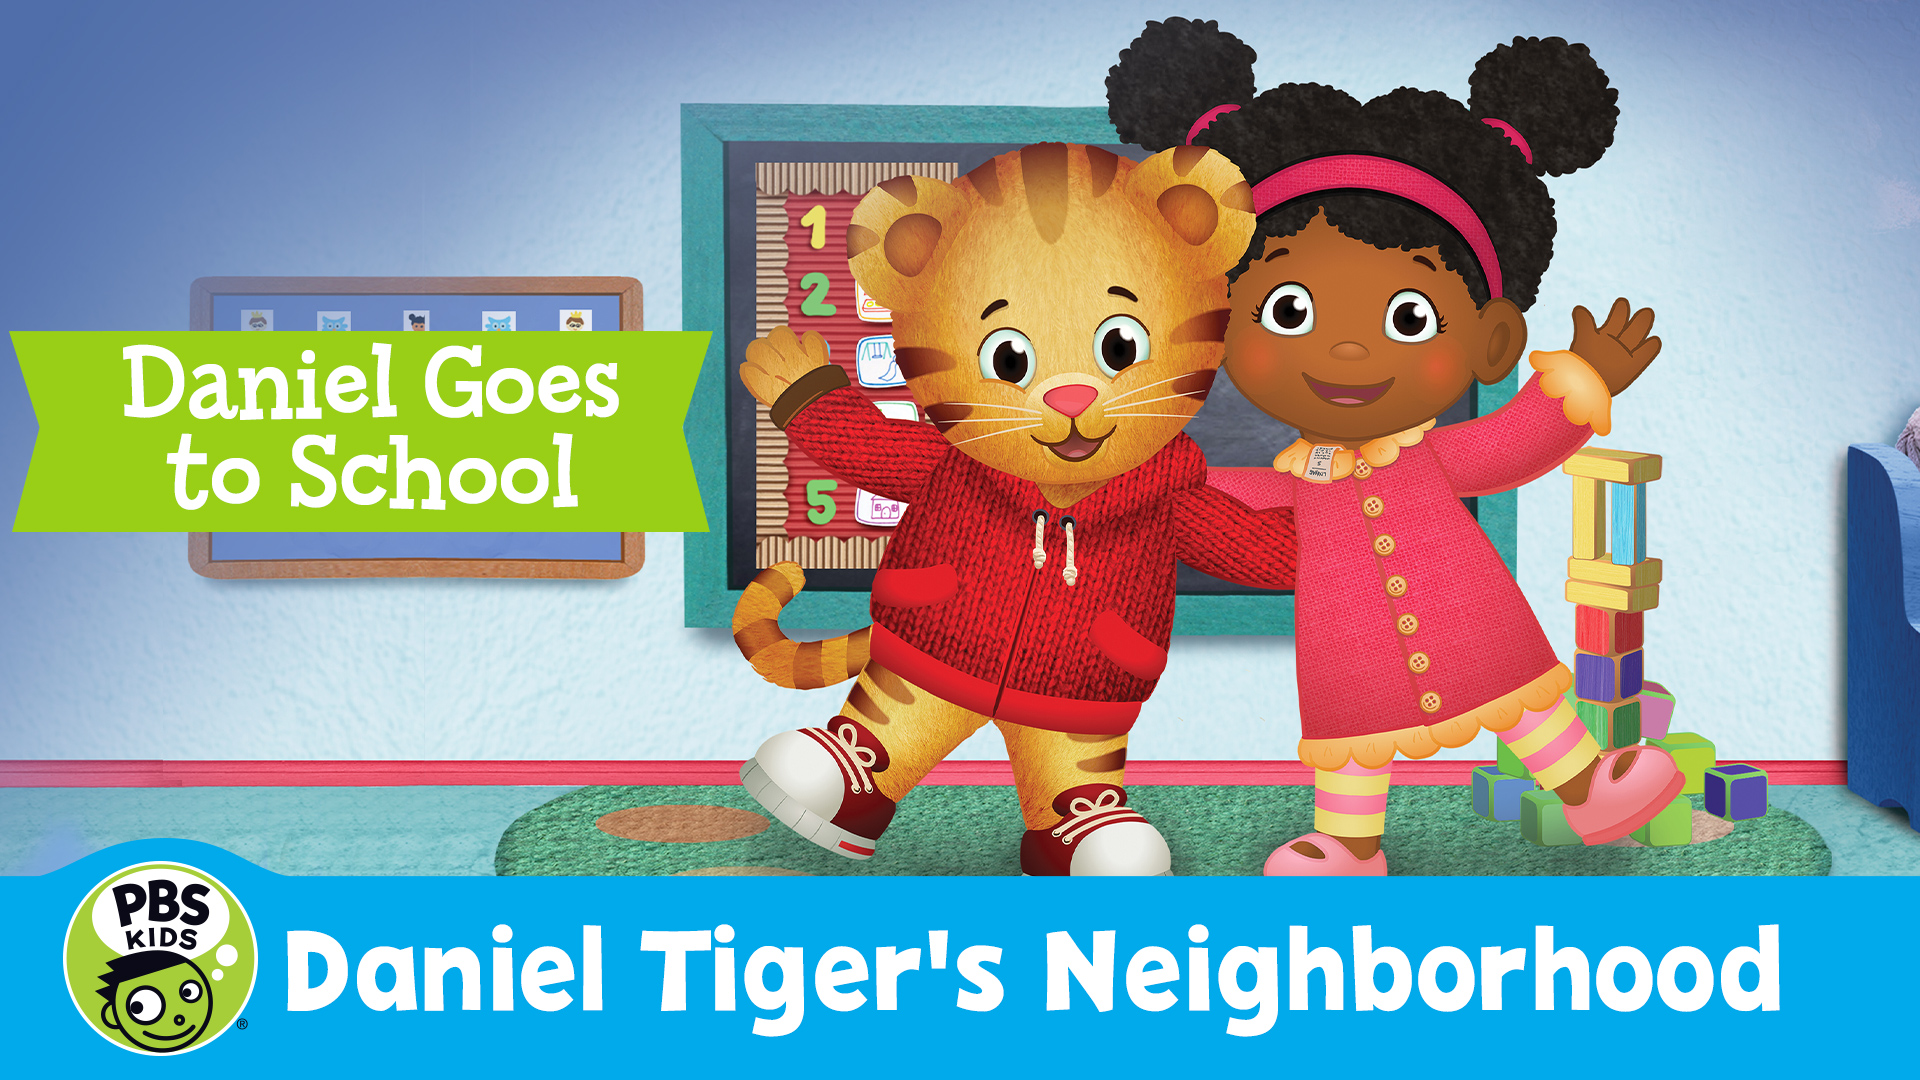 Daniel Tiger's Neighborhood: Daniel Goes to School